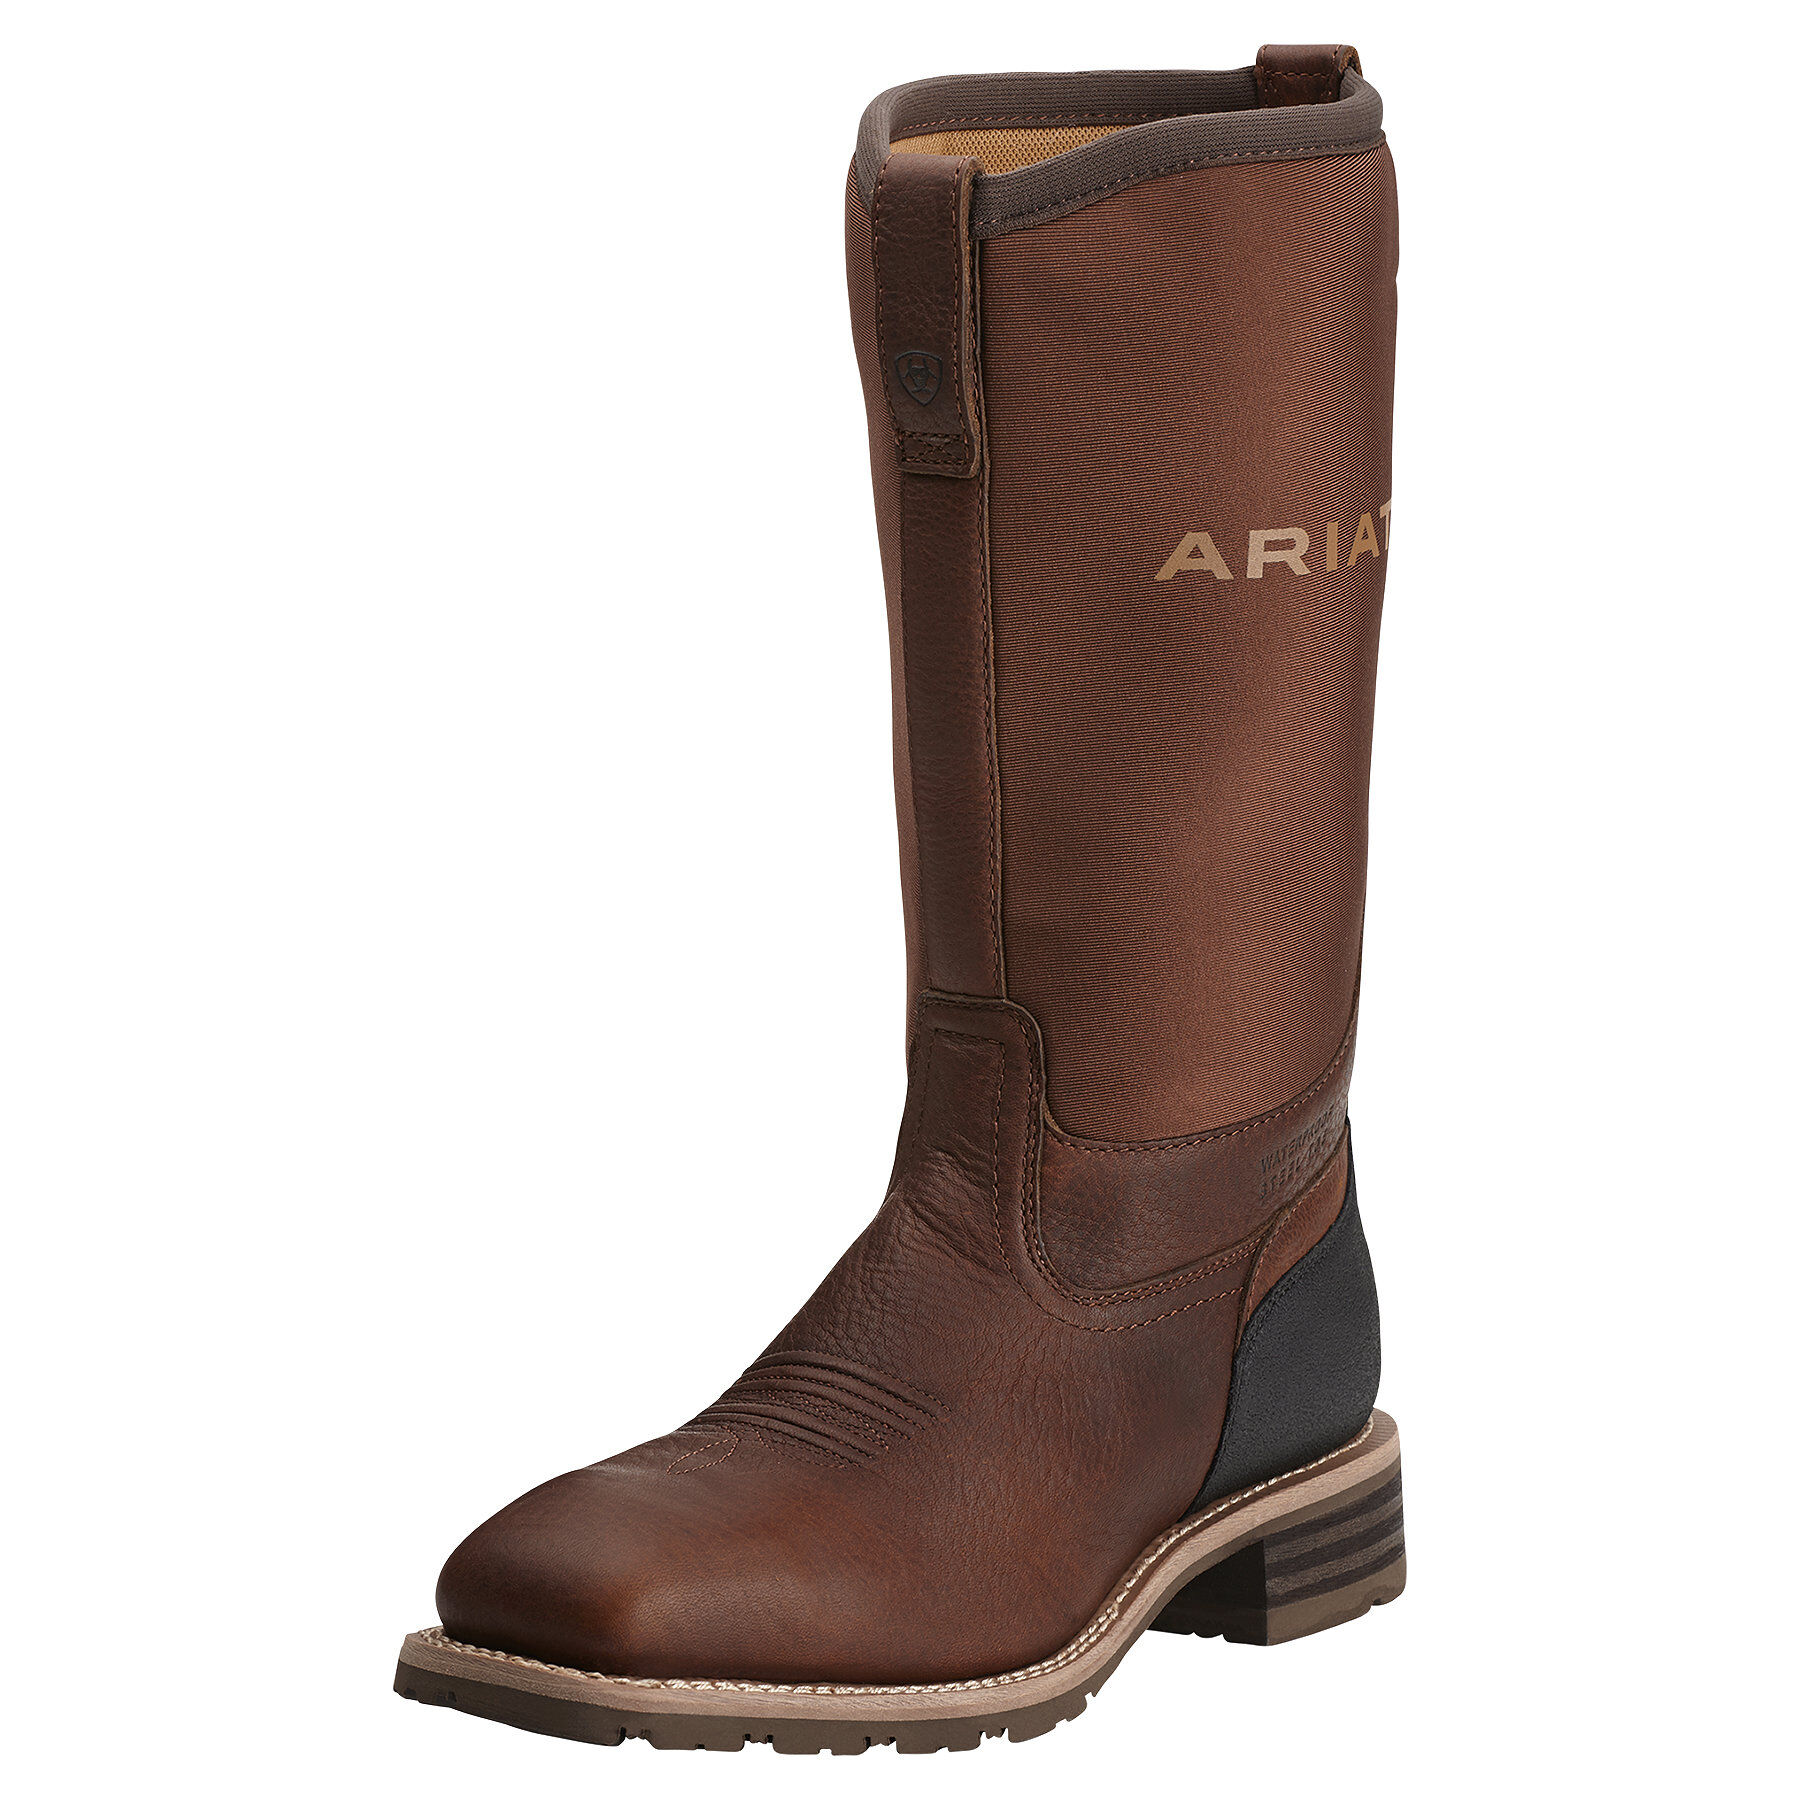 Hybrid All Weather Waterproof Steel Toe